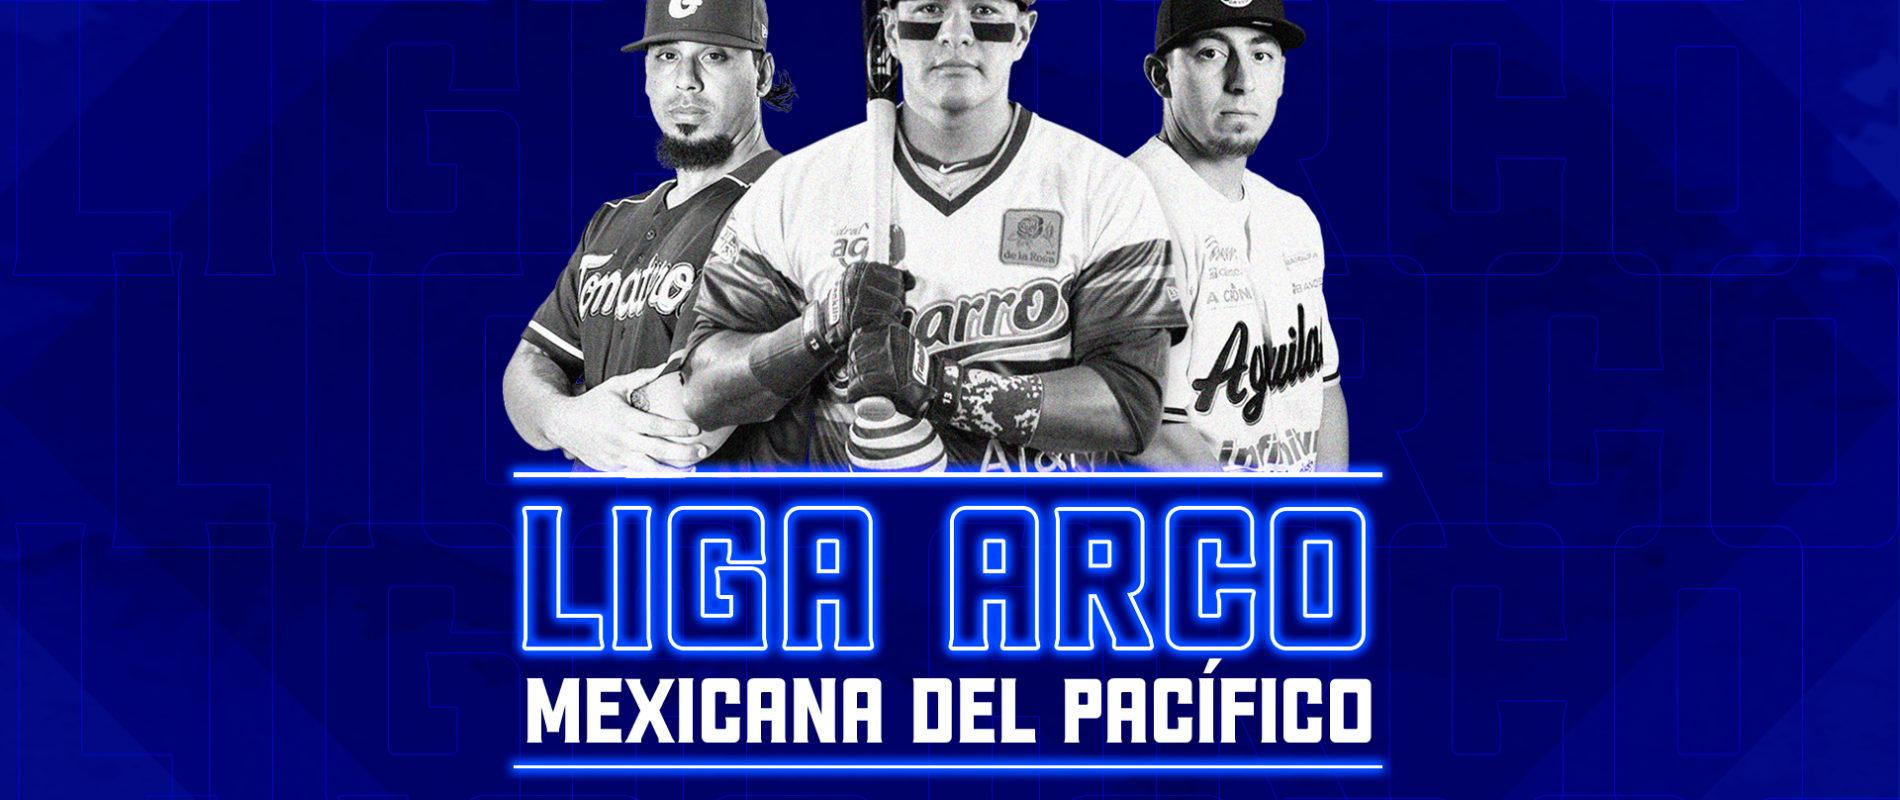 FOTO: Twitter @Liga_Arco.